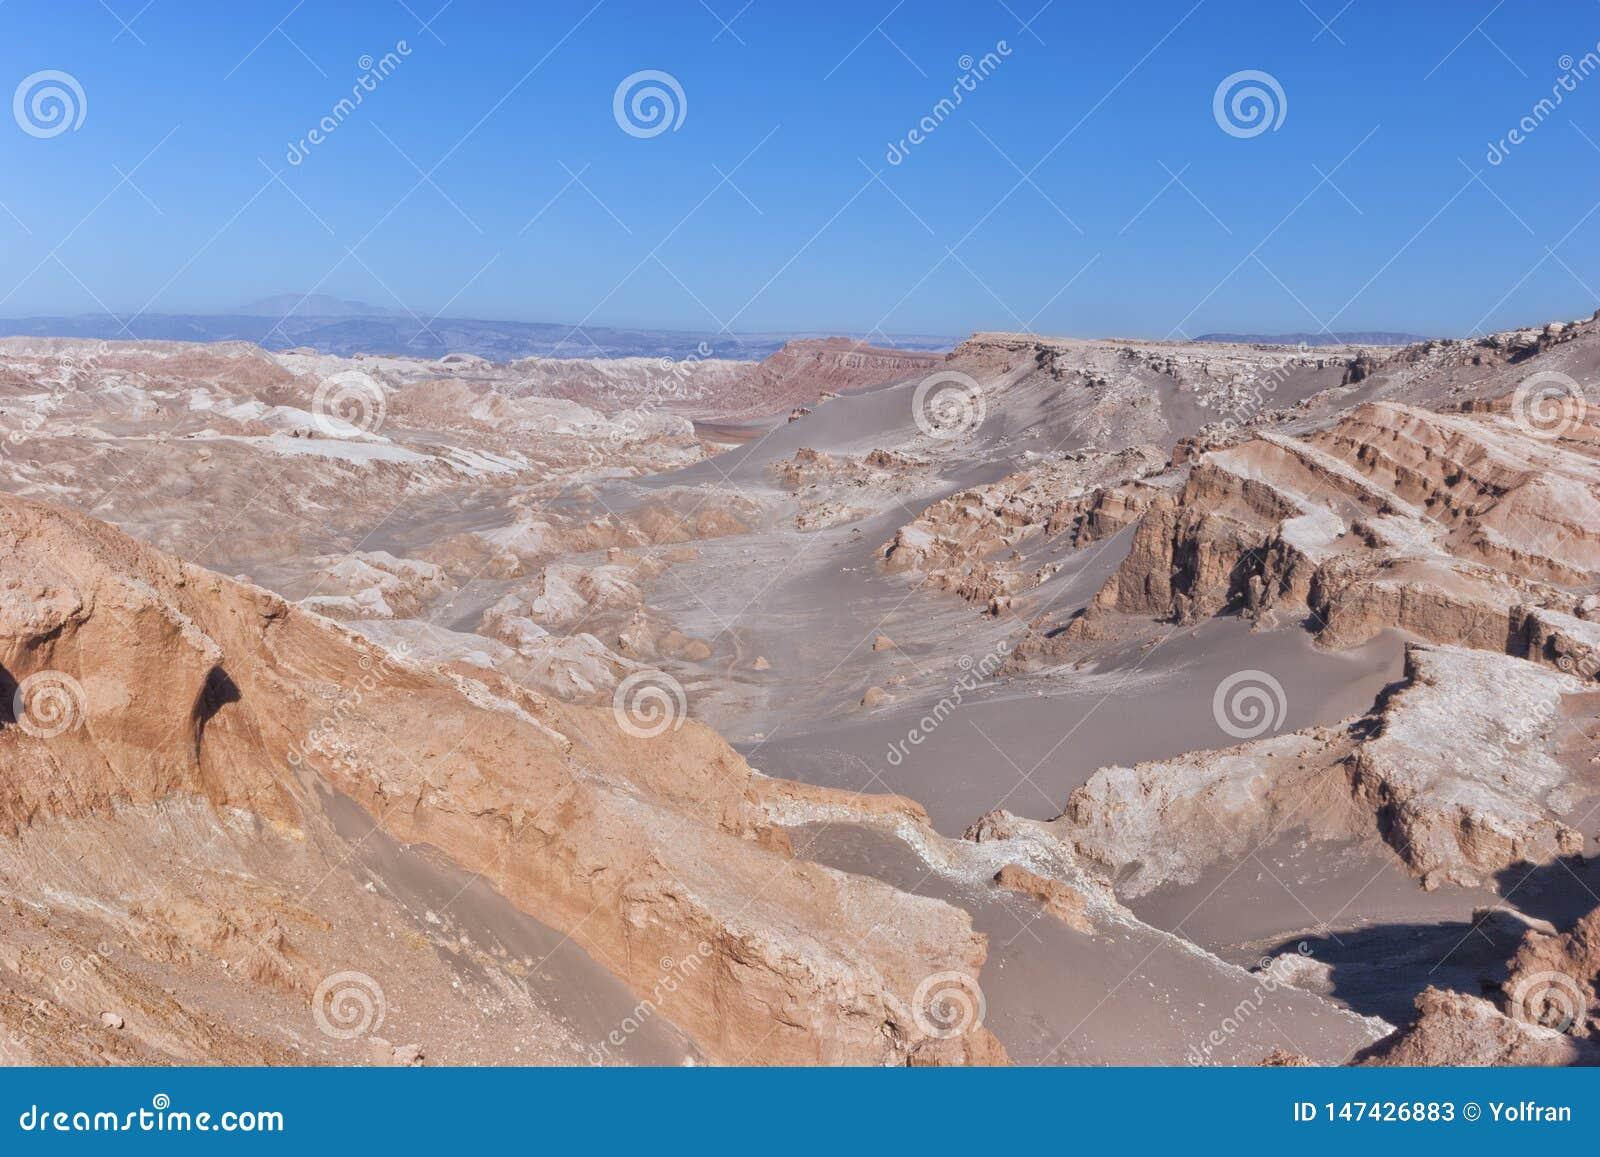 Atacama desert, canyons of surreal Moon Valley, Chile .